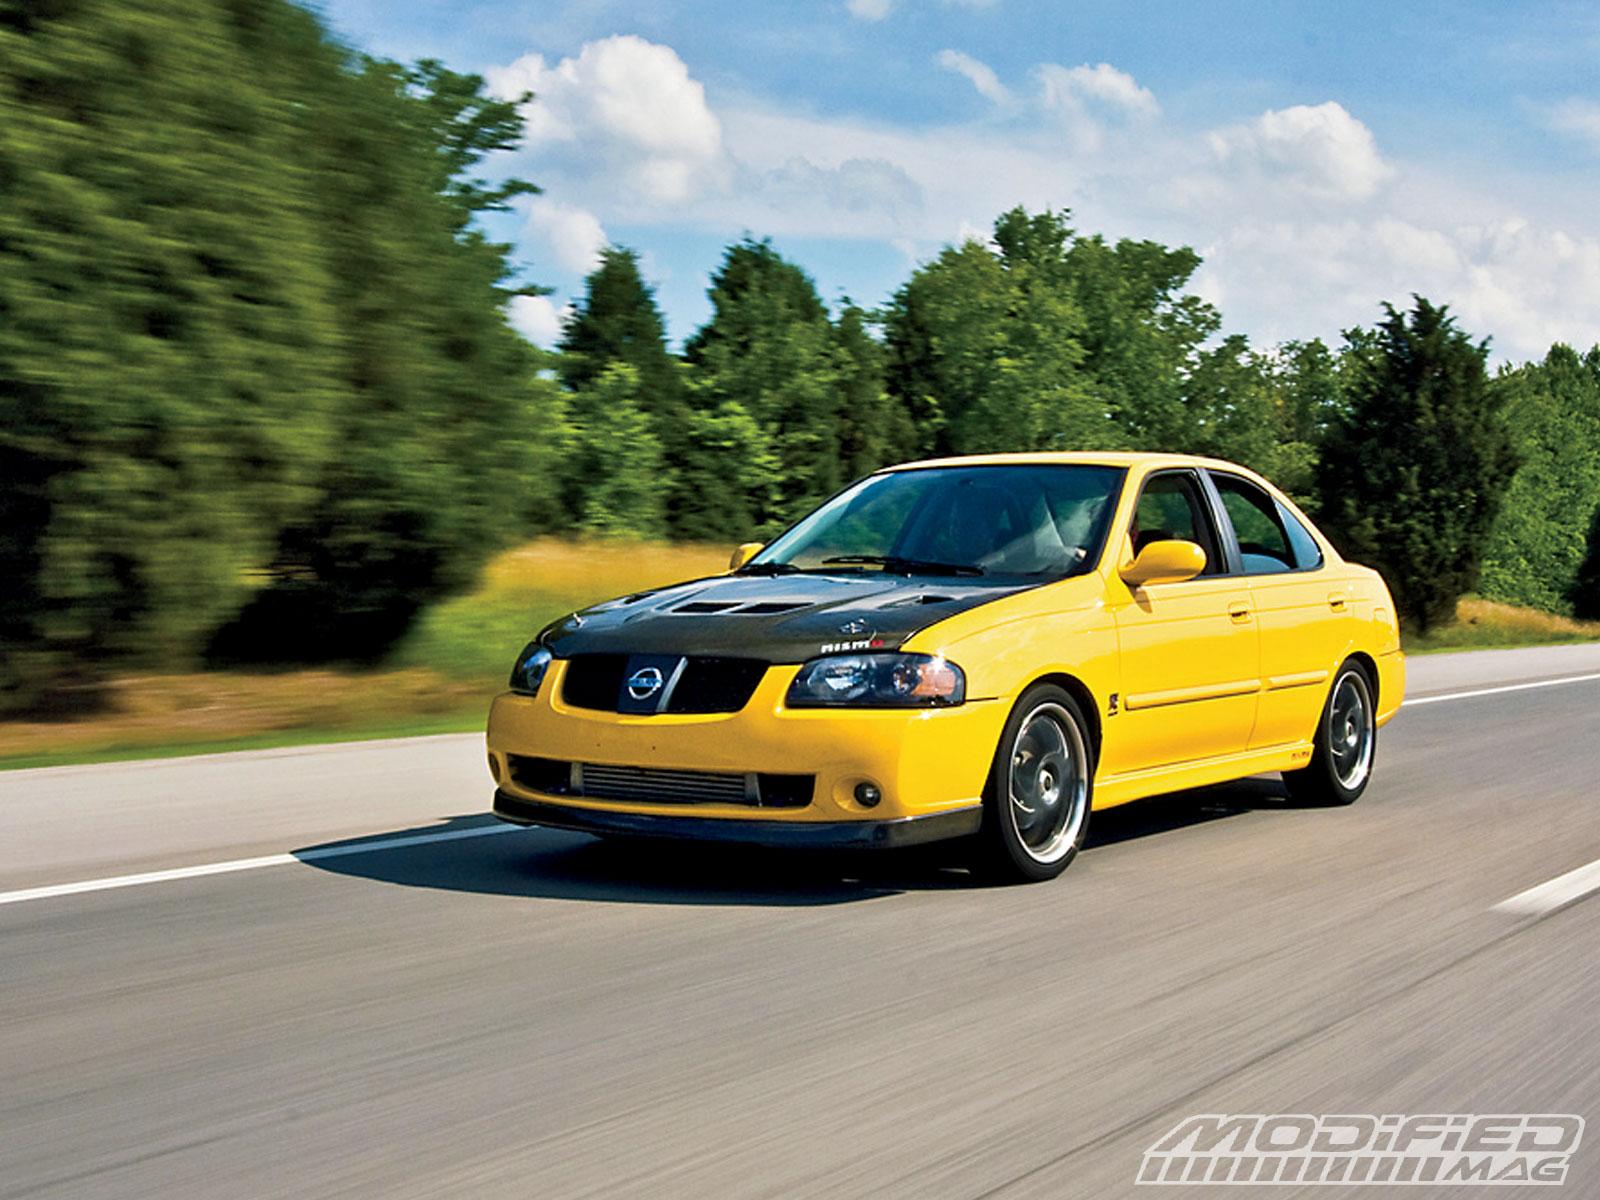 Nissan sentra se r technical details history photos on better nissan sentra se r photo 10 vanachro Gallery